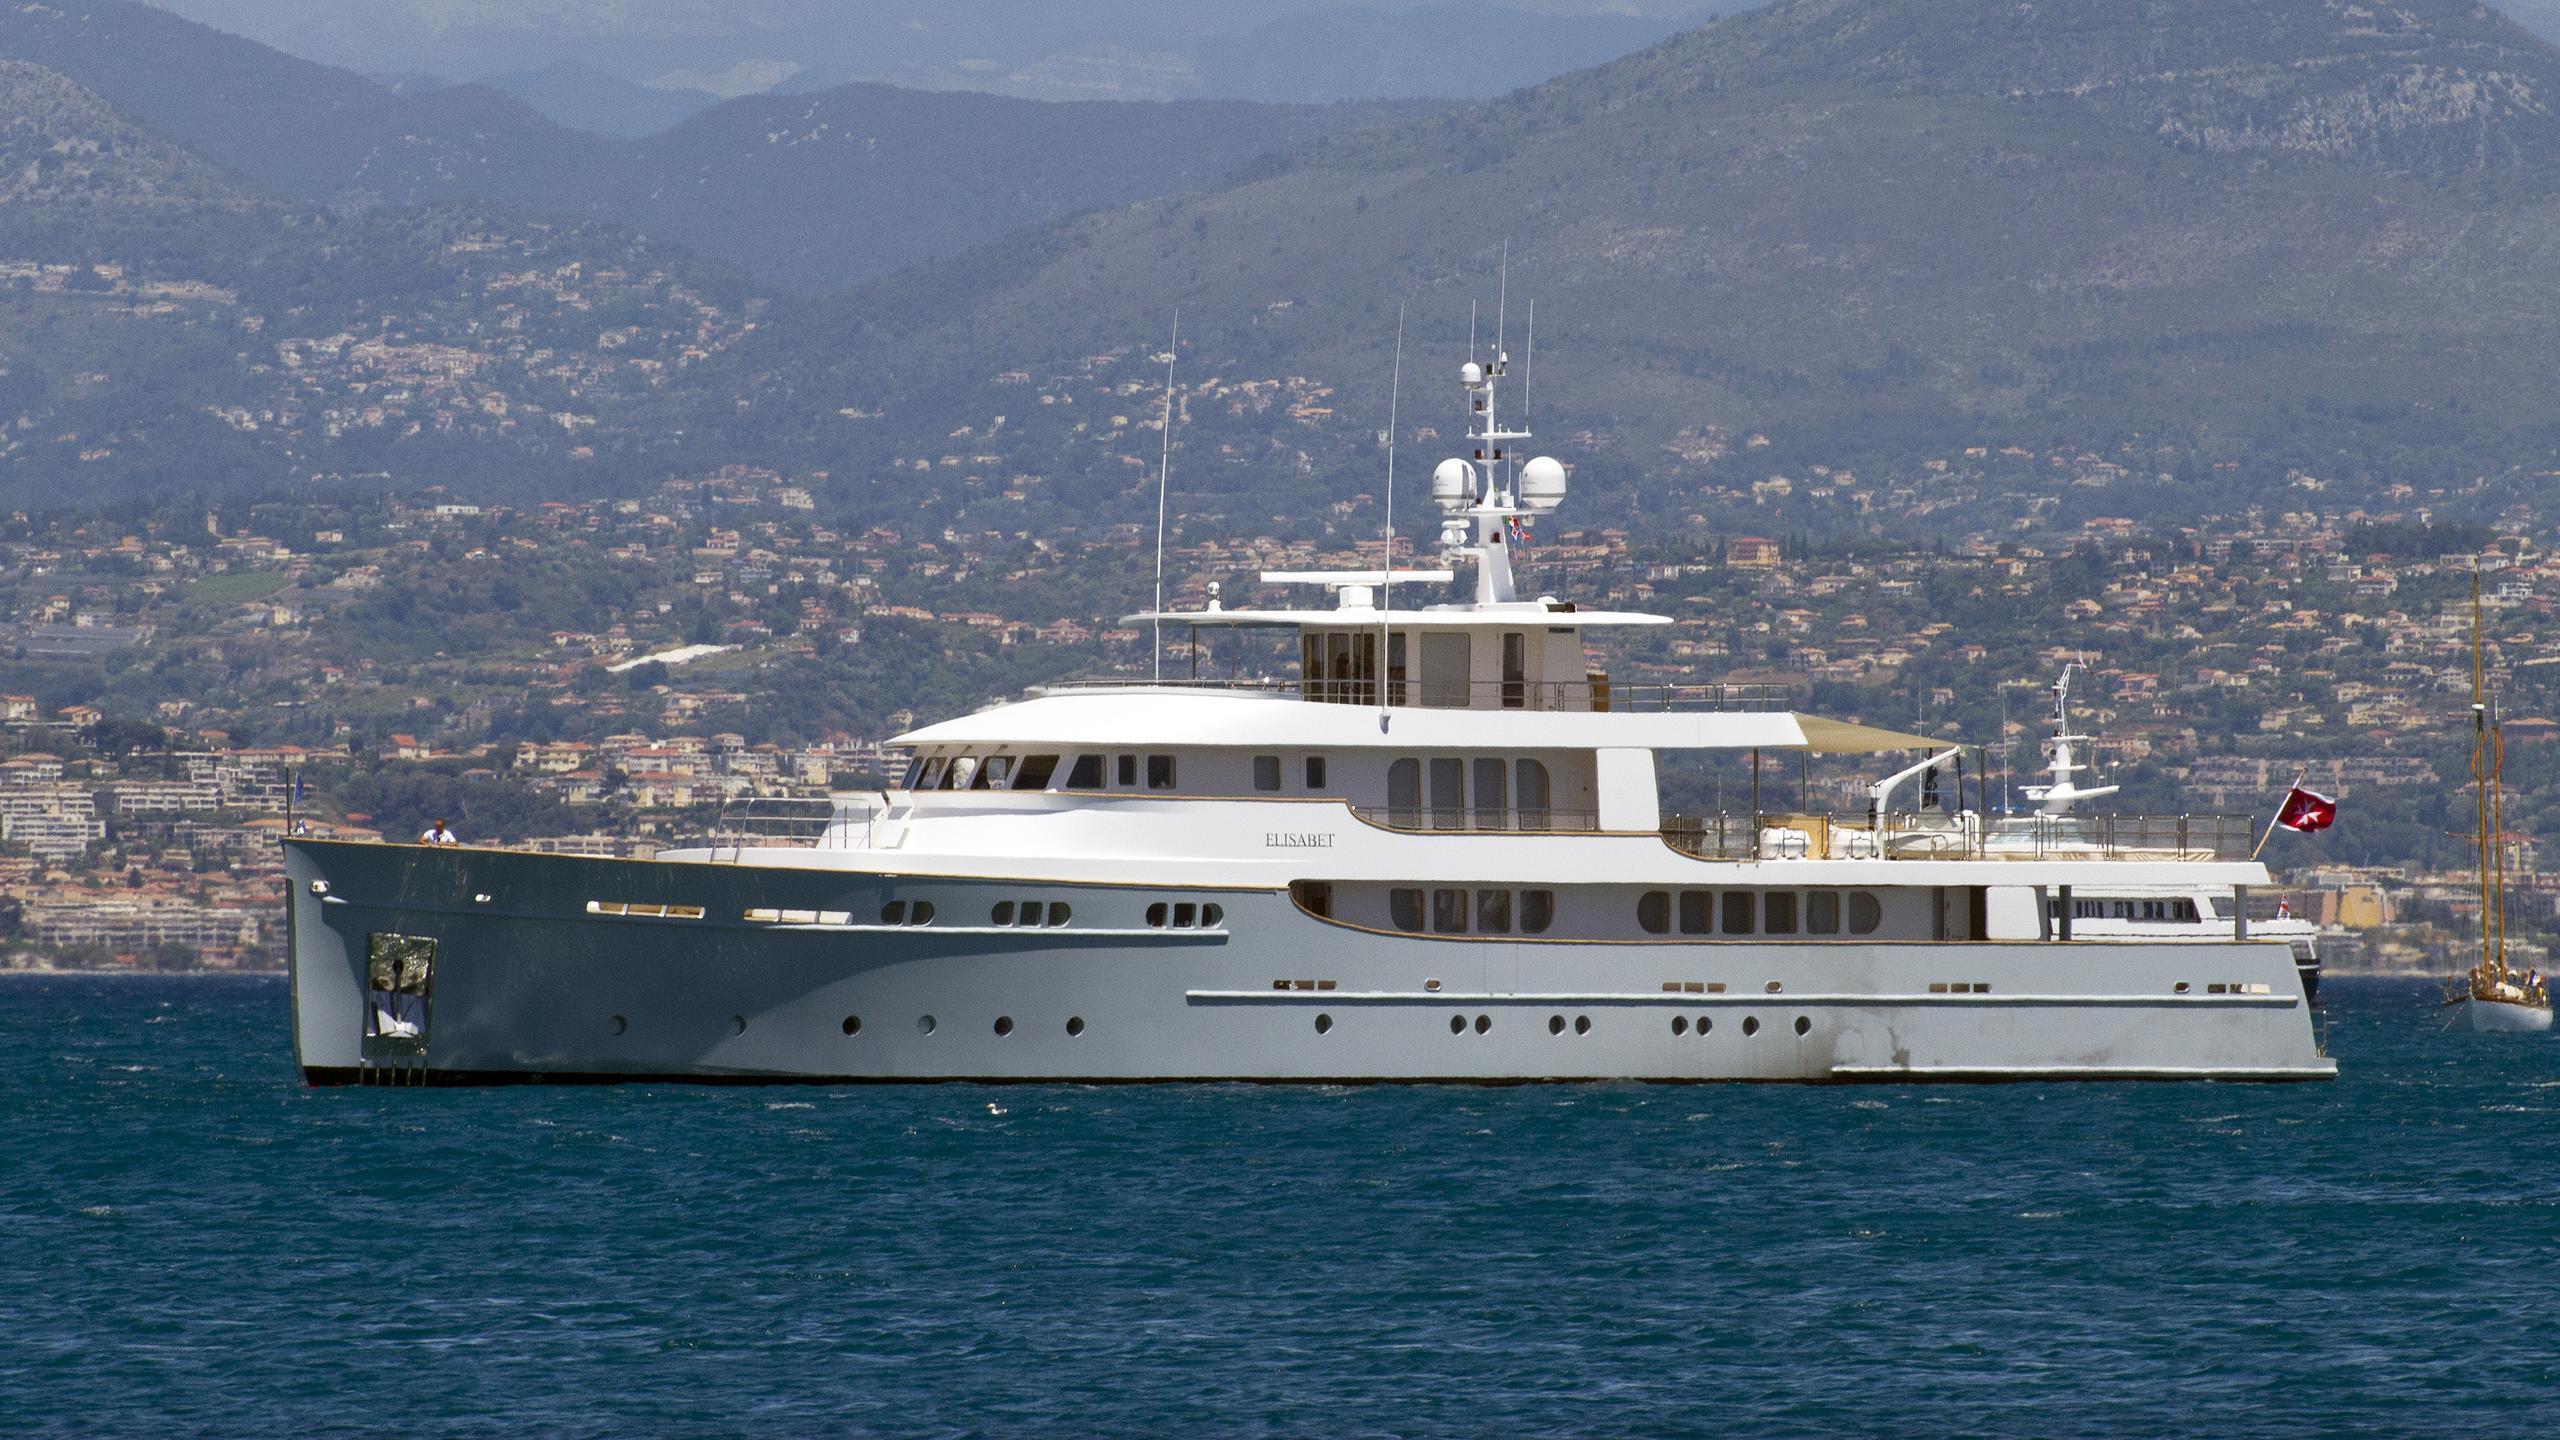 elisabet-motor-yacht-ocea-2011-47m-profile